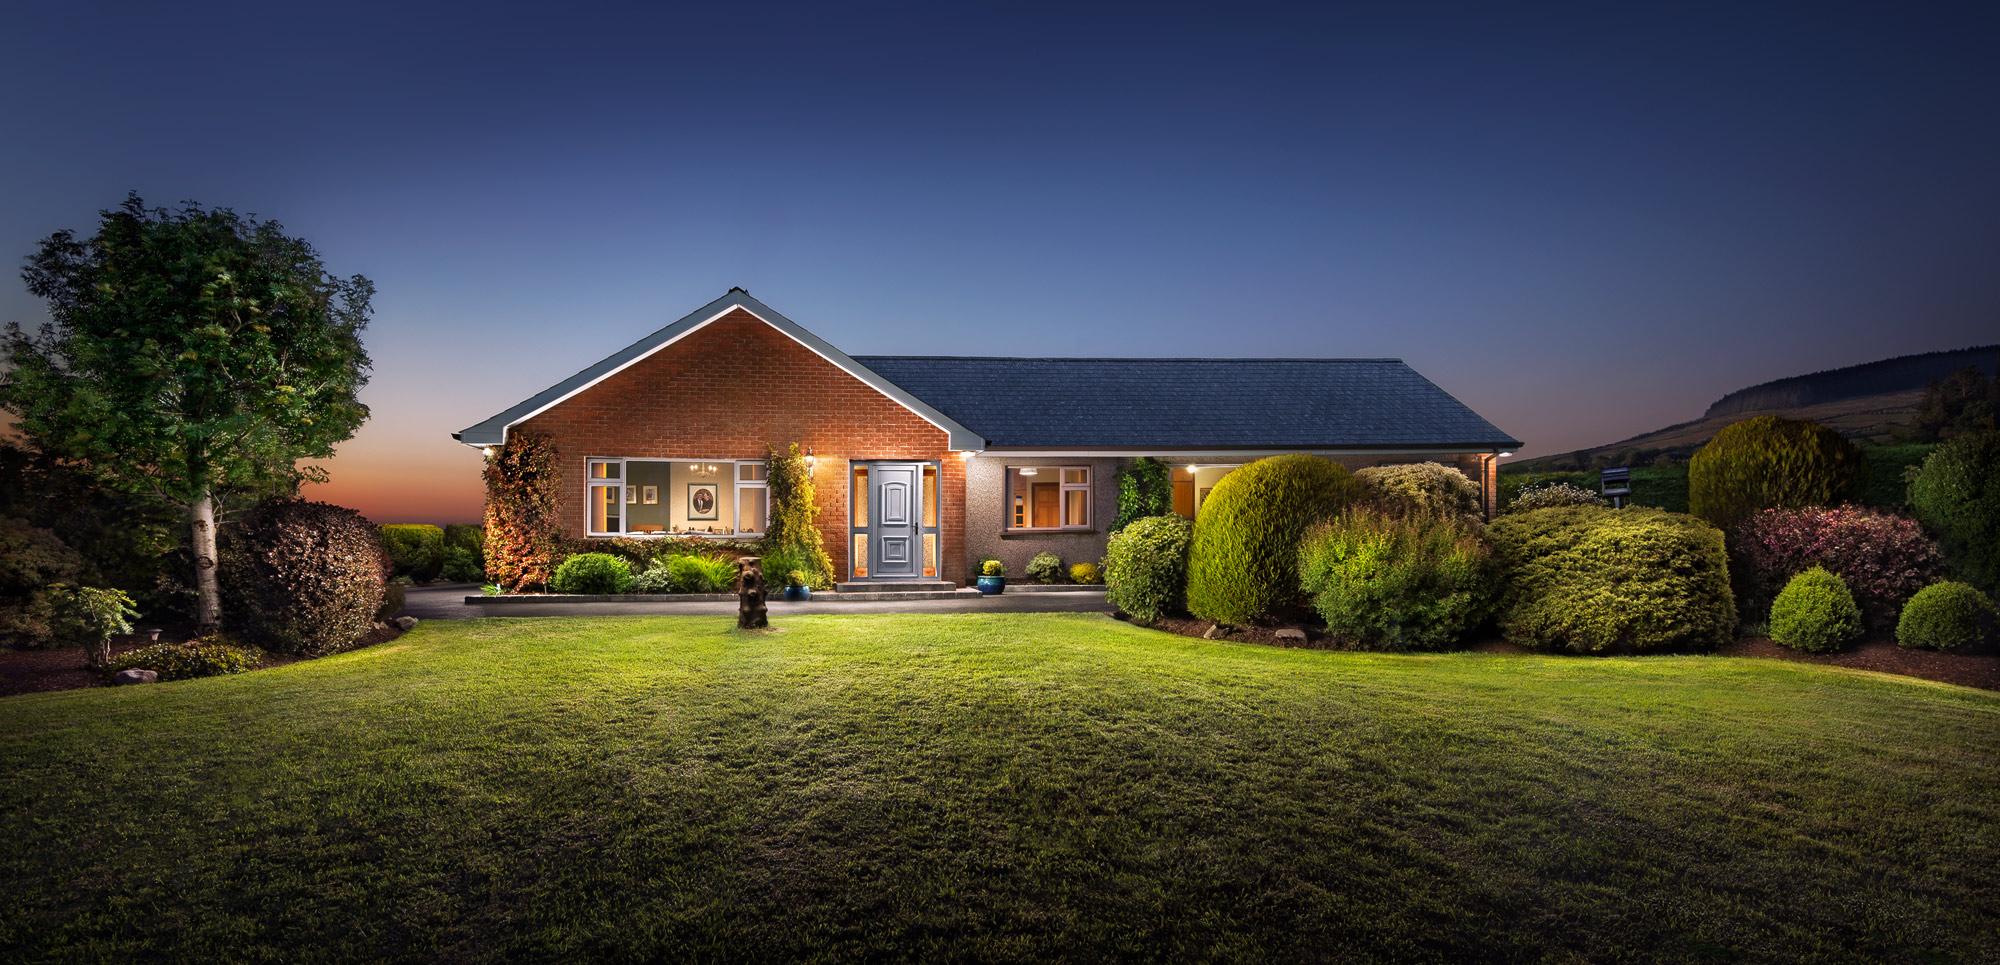 Home Portrait Photography